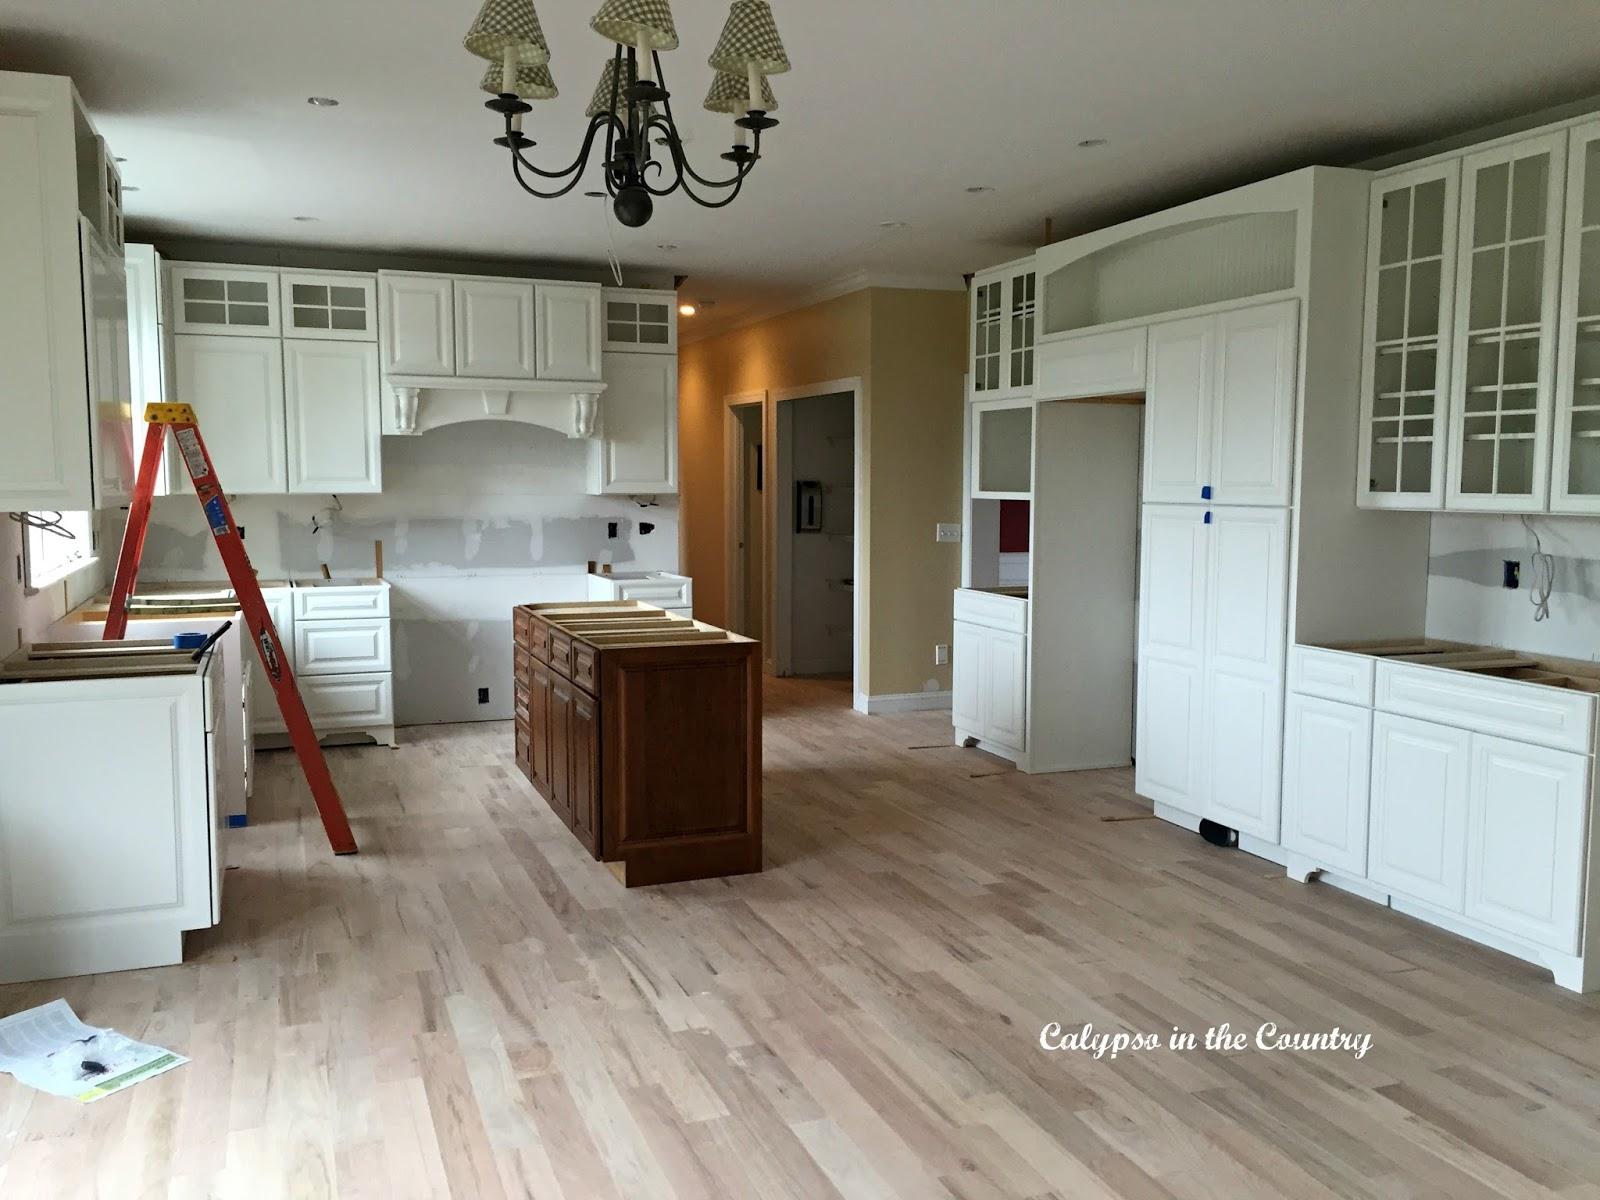 Kitchen Renovation Progress